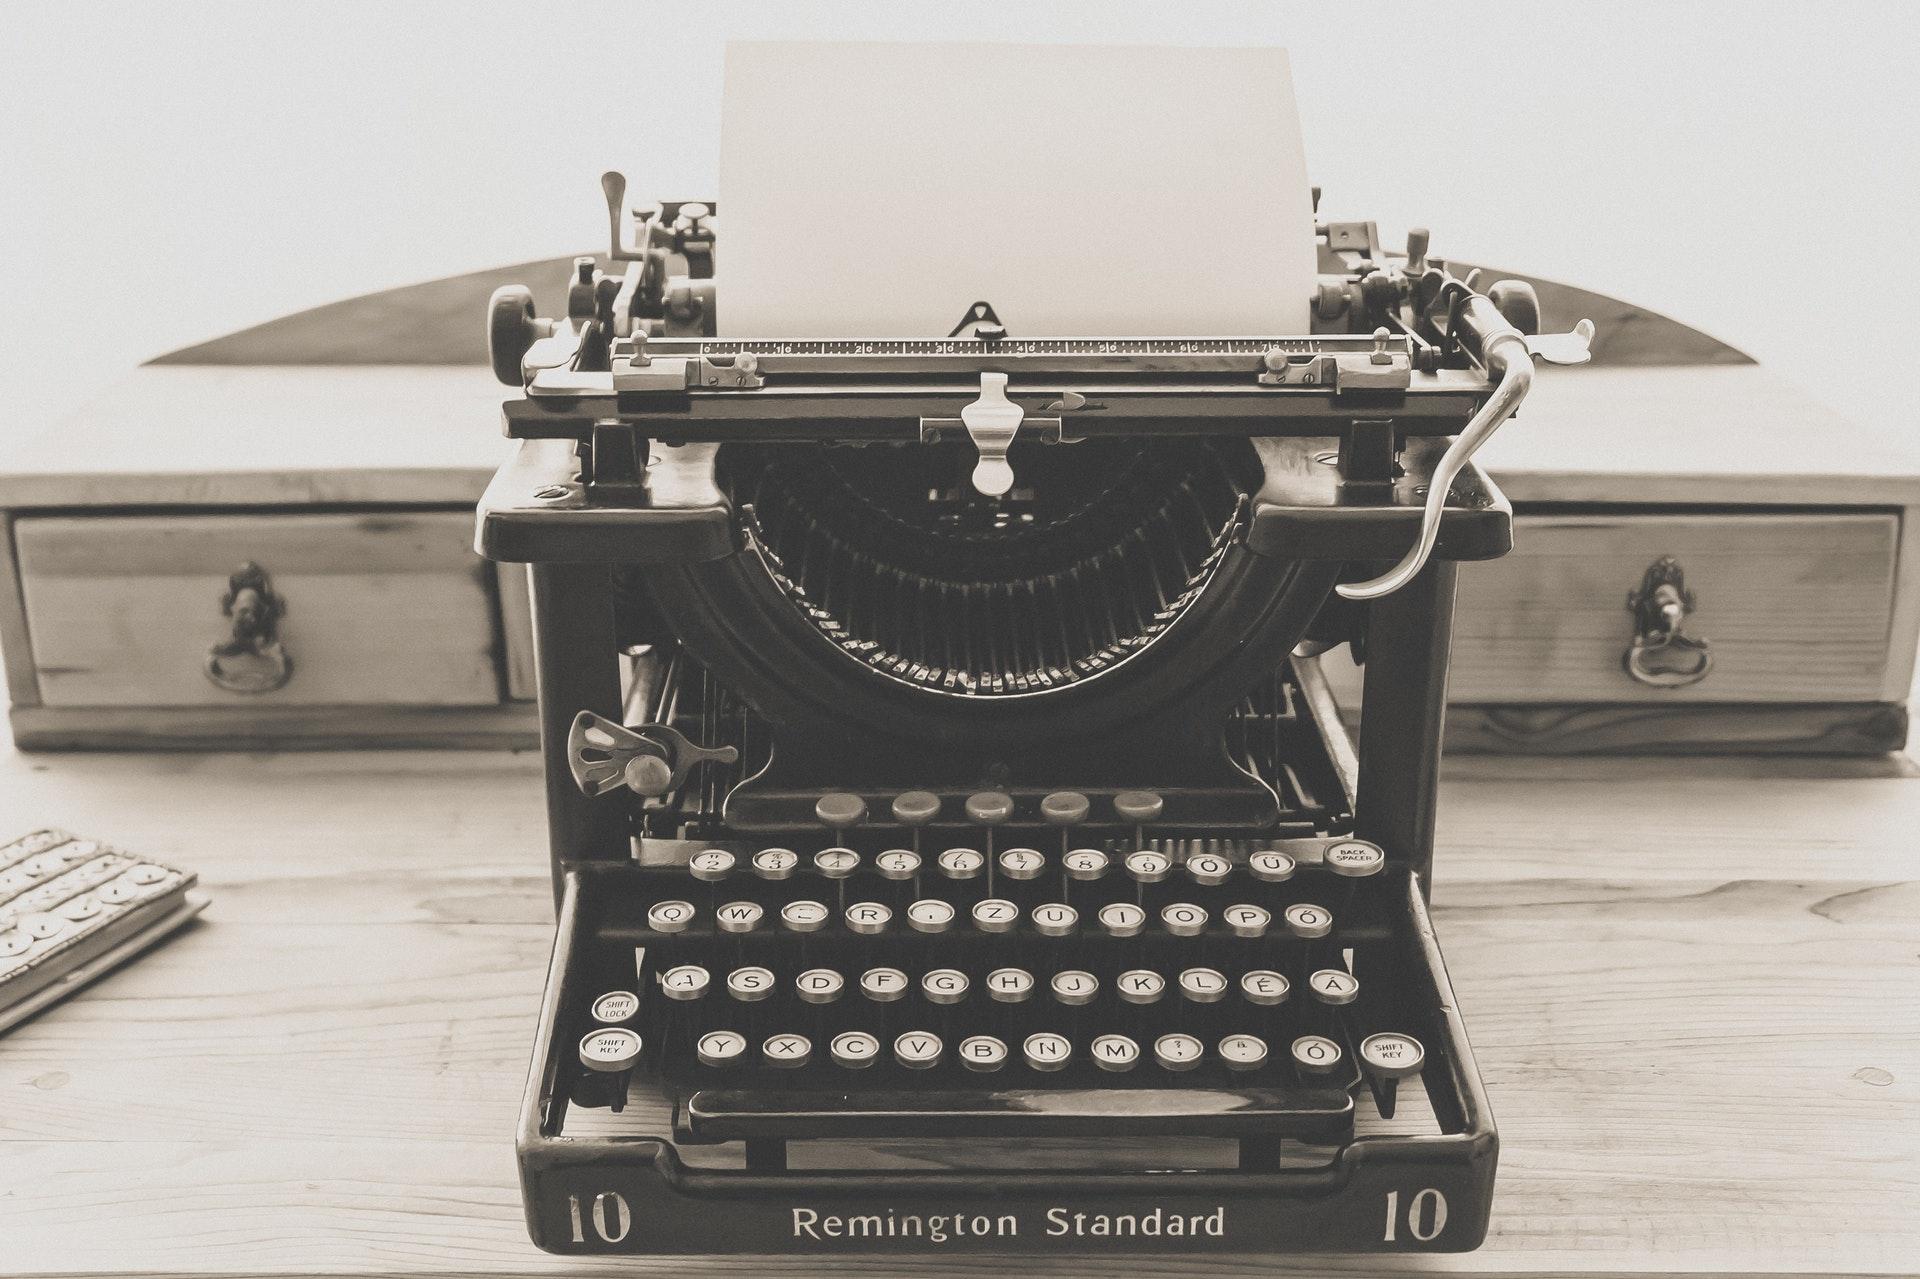 Old Remington Standard typewriter with blank page